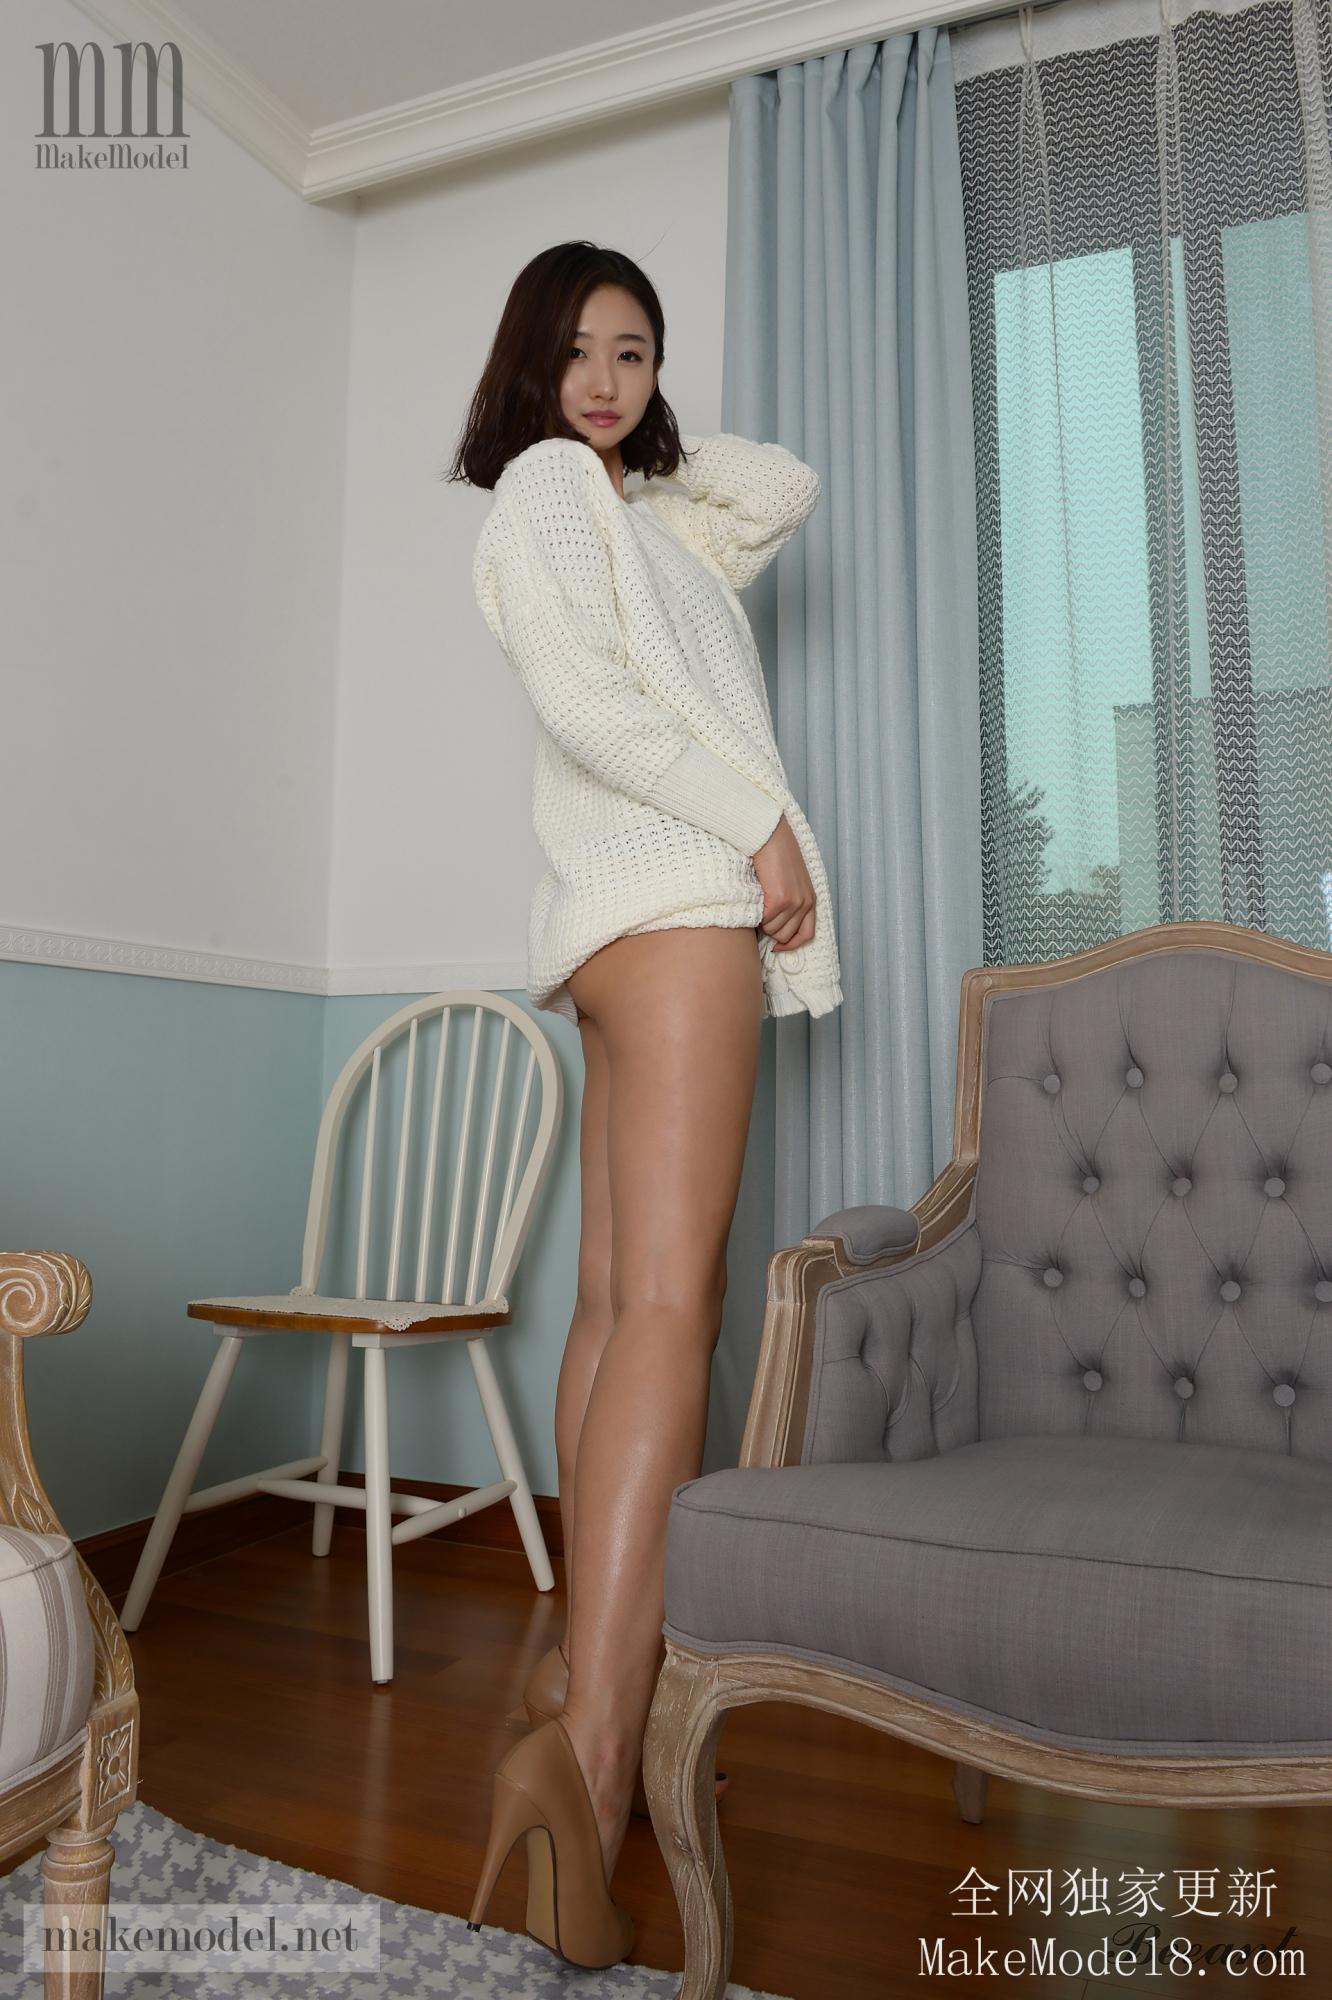 makemodel-SEJIN.빛나는 몸매(41P) - 貼圖 - 清涼寫真 -